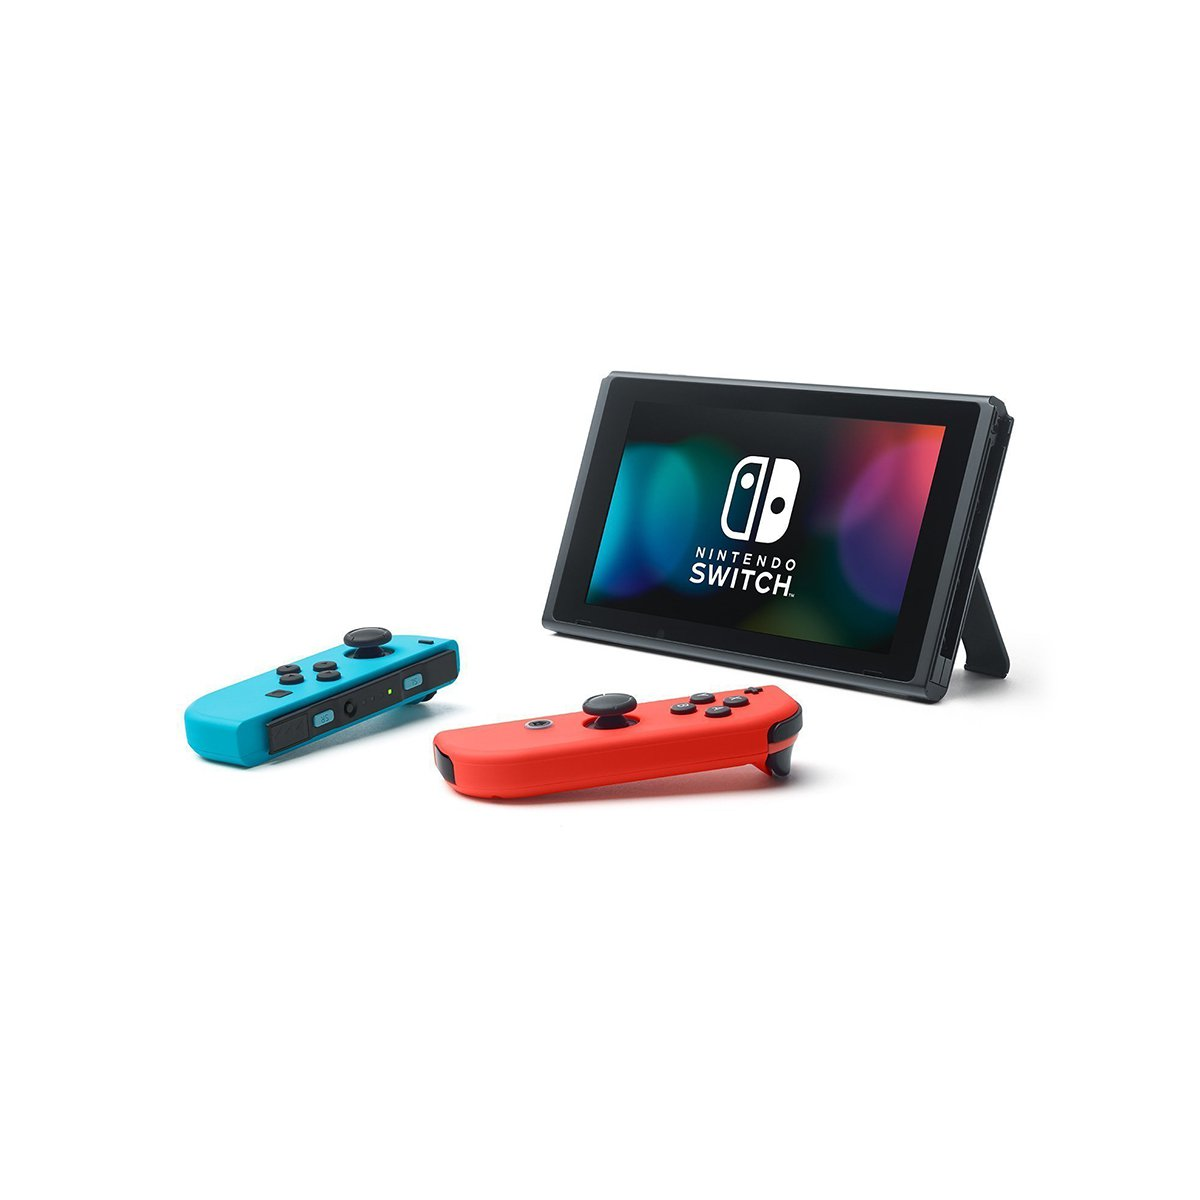 Nintendo 任天堂 Switch 游戏机 (红蓝Joy-Con手柄)